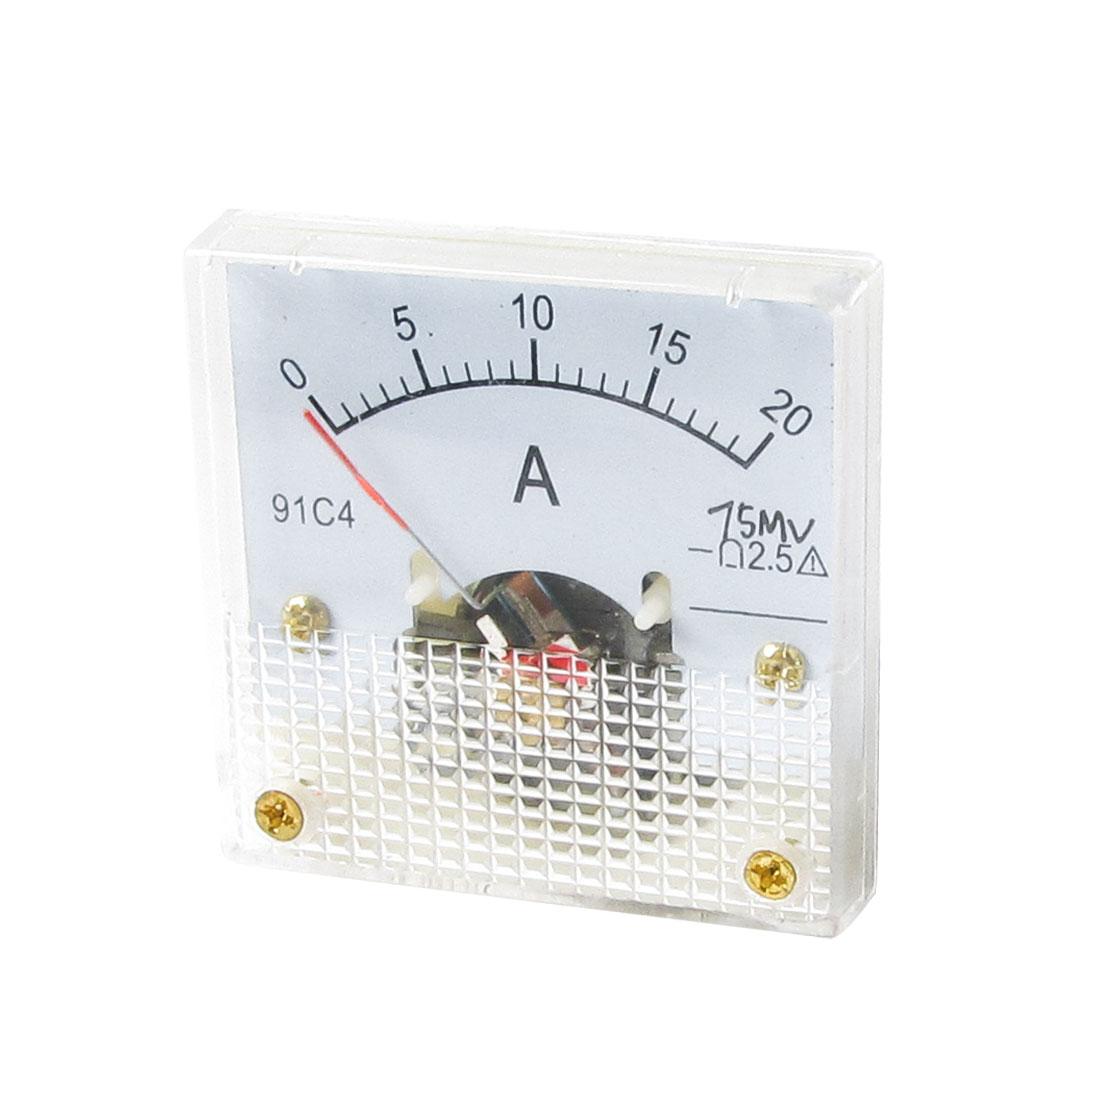 Analogue DC Current Panel Meter 0-20A Amperemeter Gauge w Screws